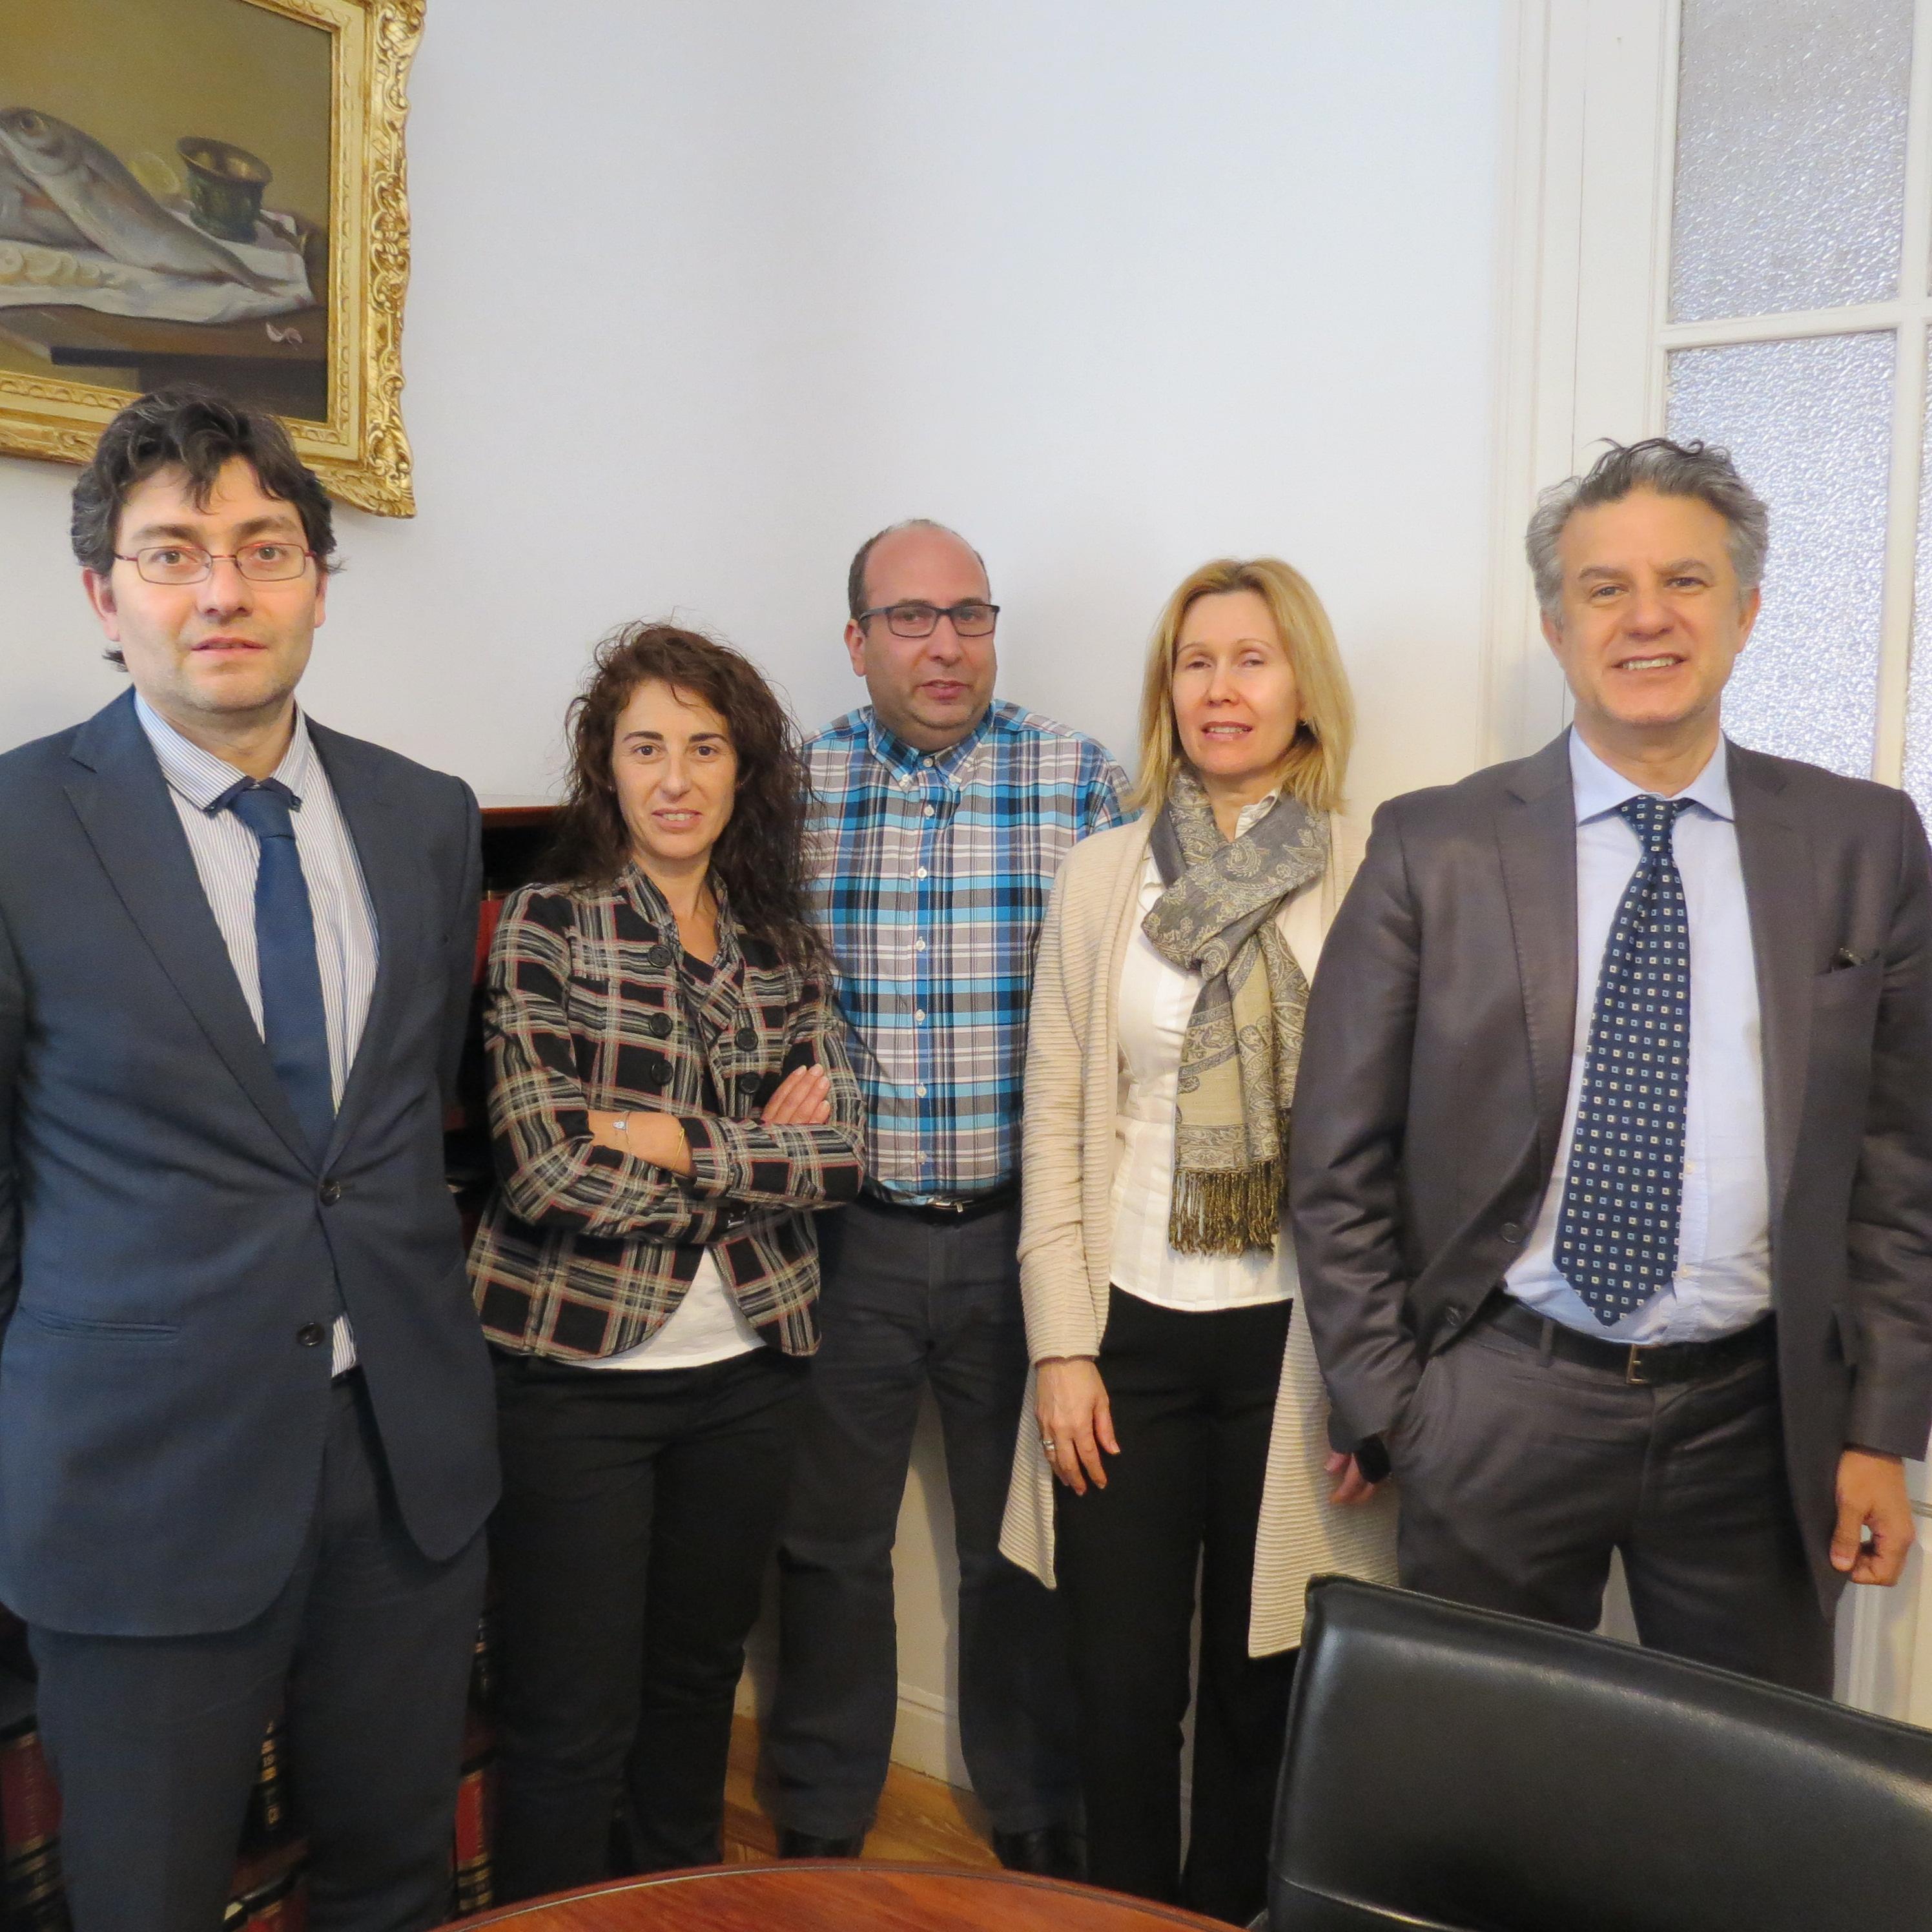 Fbernal abogados extranjeria e inmigracion, visado denegado, recursos , Nacionalidad